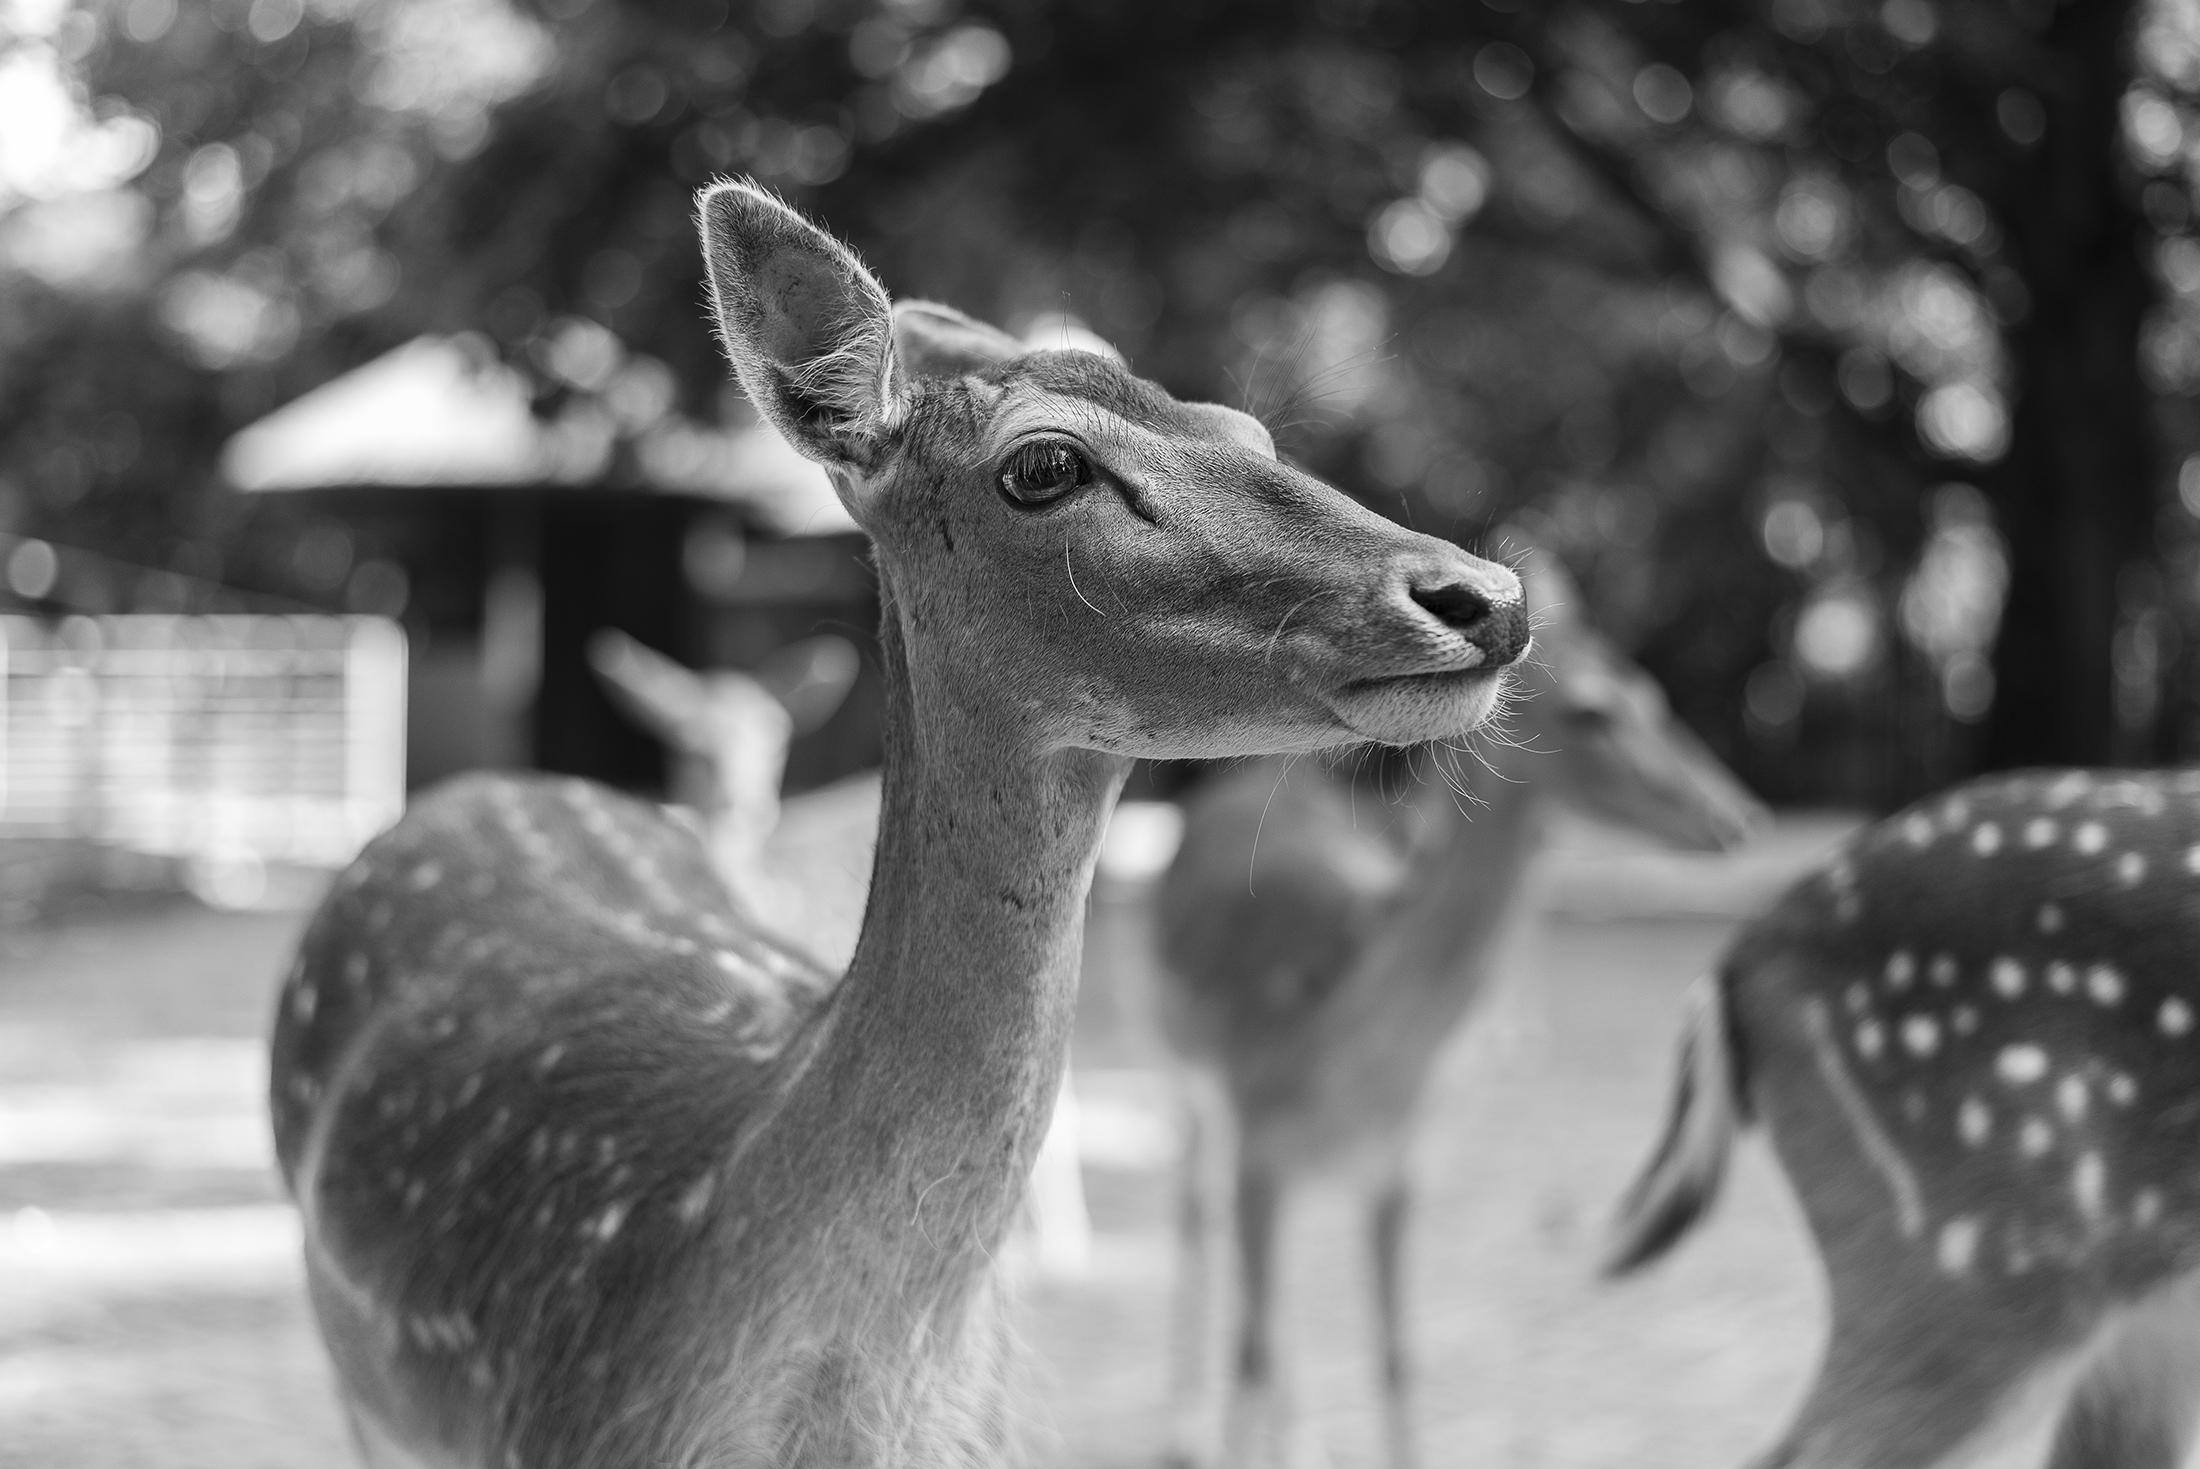 deer portrait - black and white photograph